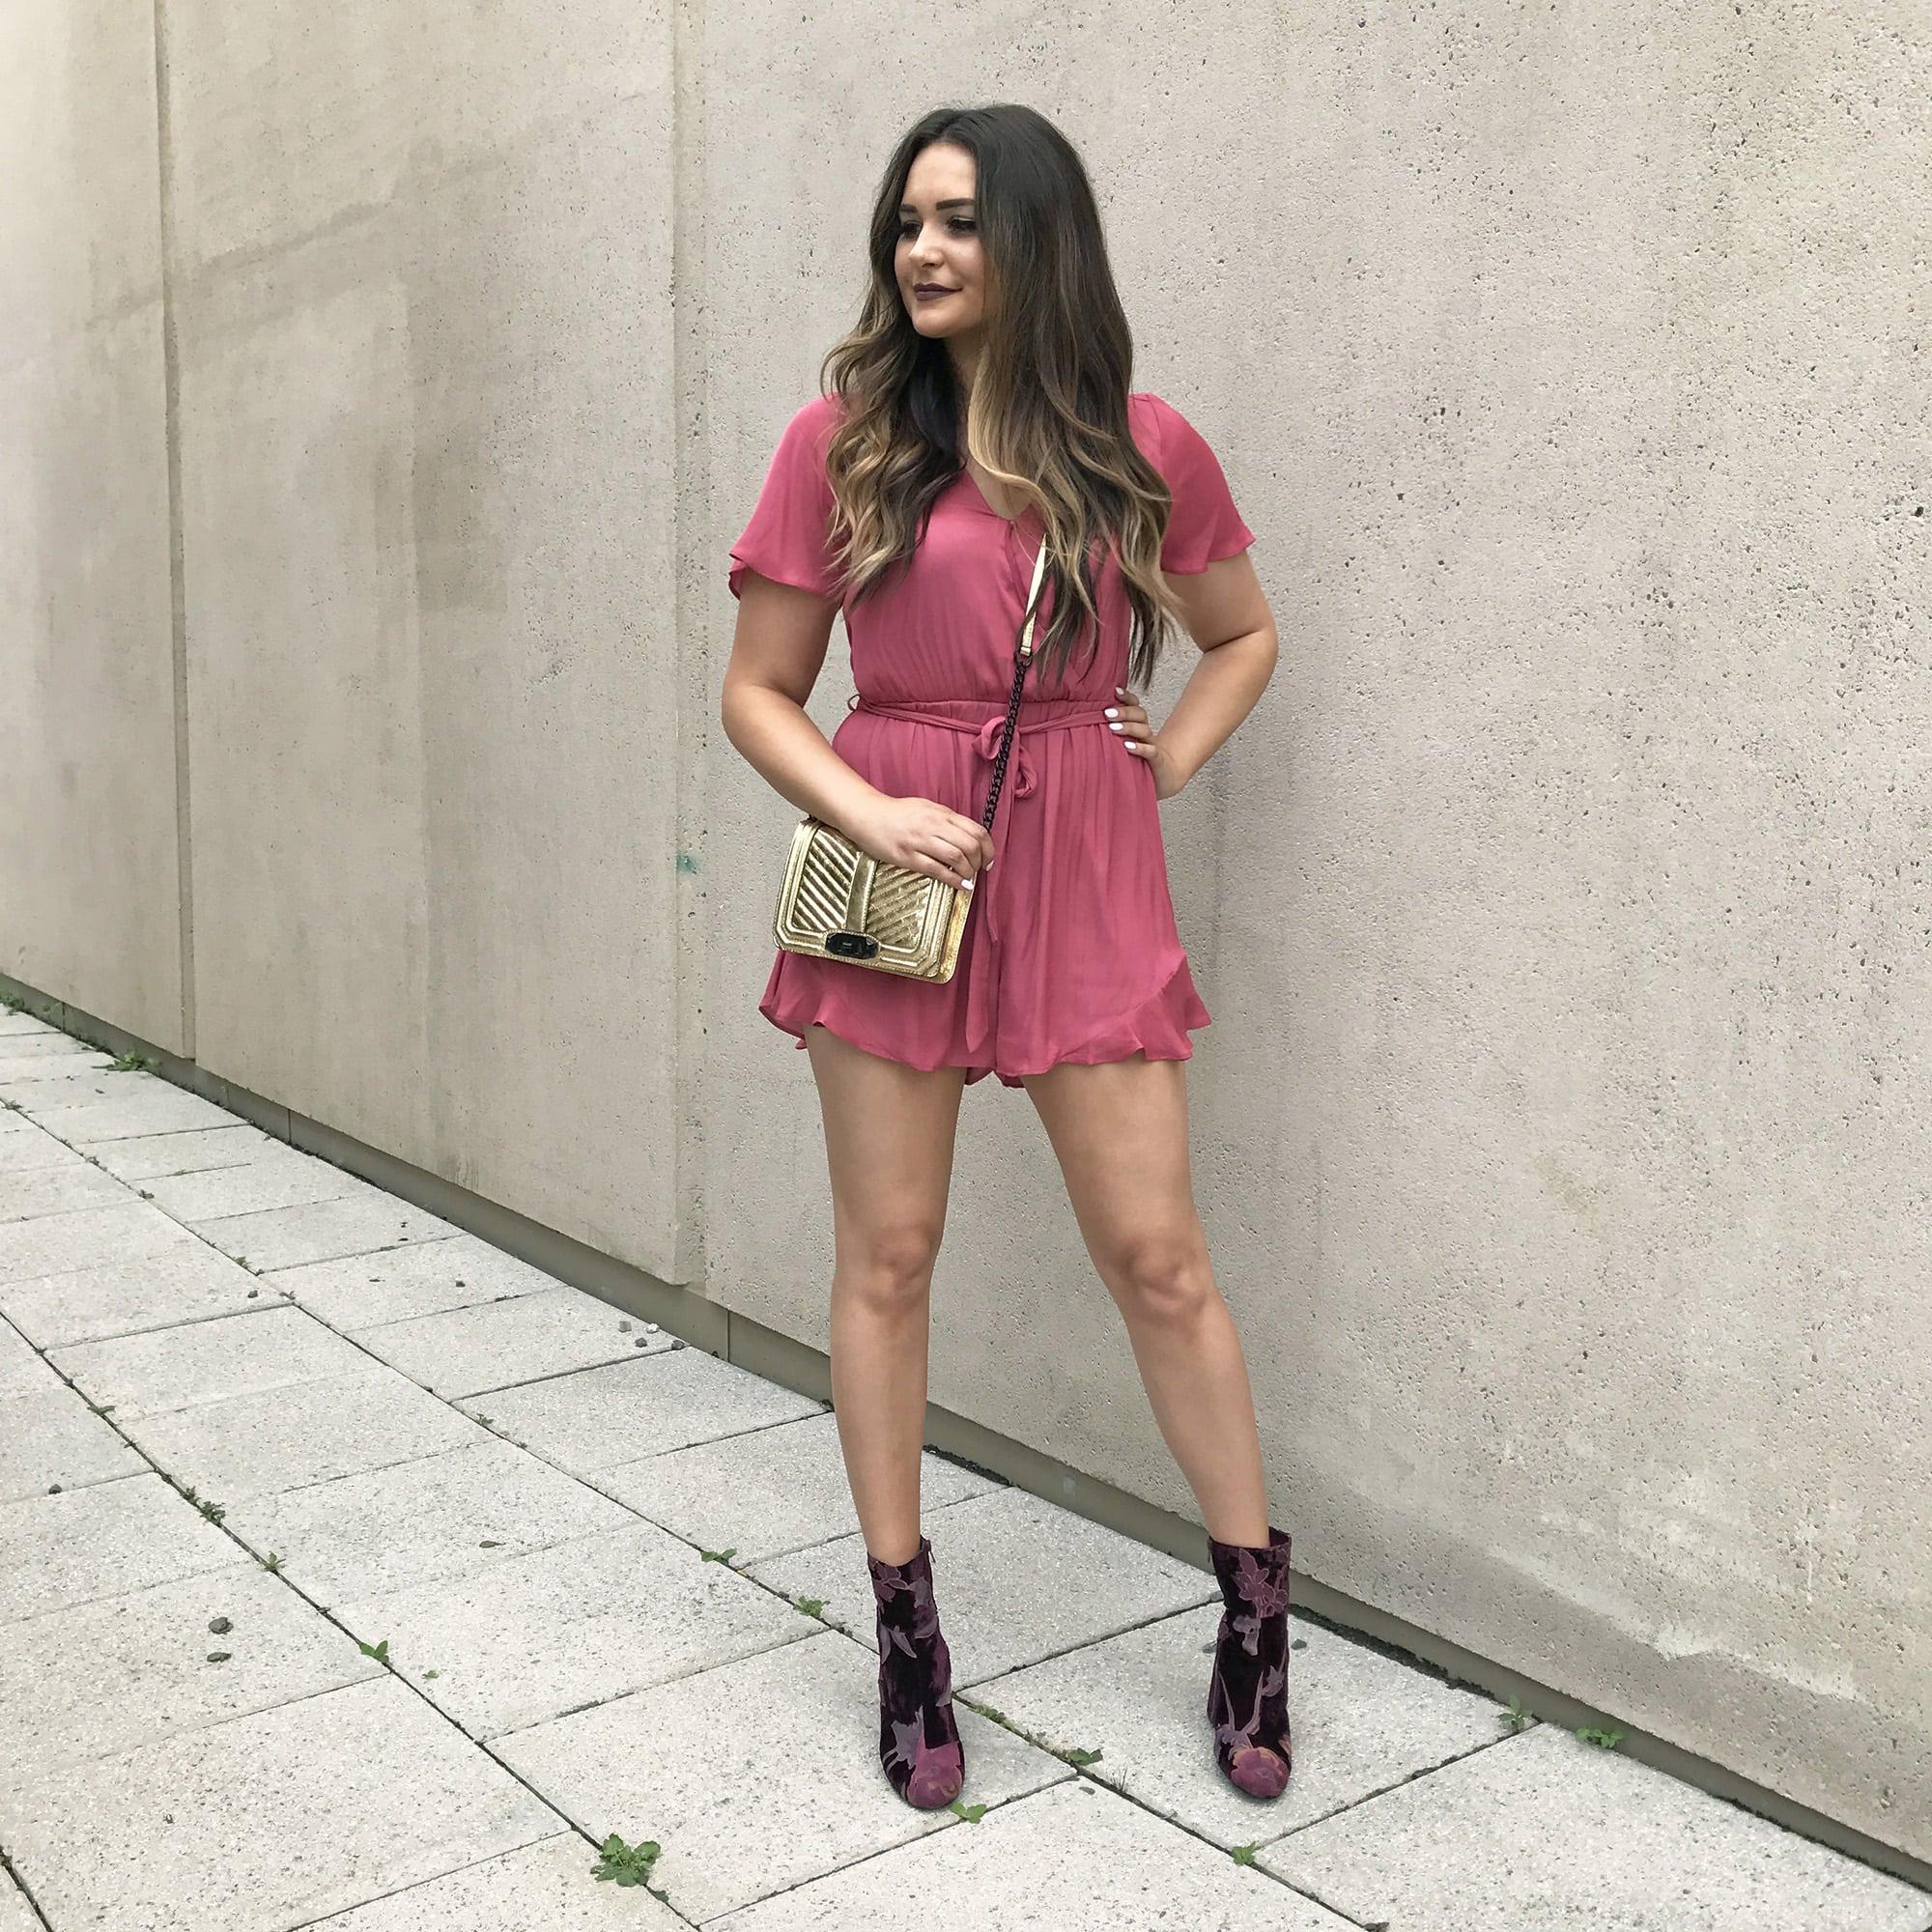 Nordstrom try on haul | beauty style blogger Mash Elle |  Nordstrom Anniversary Sale | romper